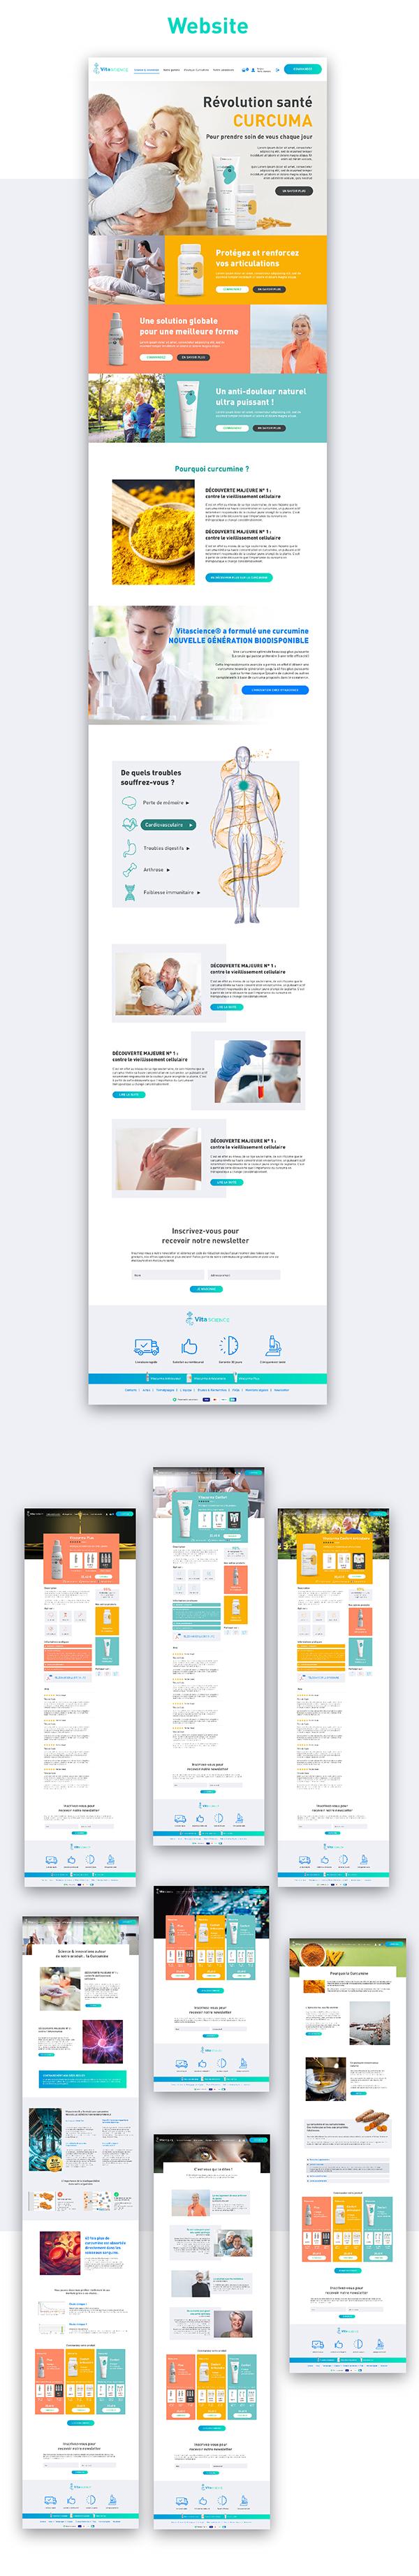 webdesign-logo-packaging-lille-justin-delmotte-4